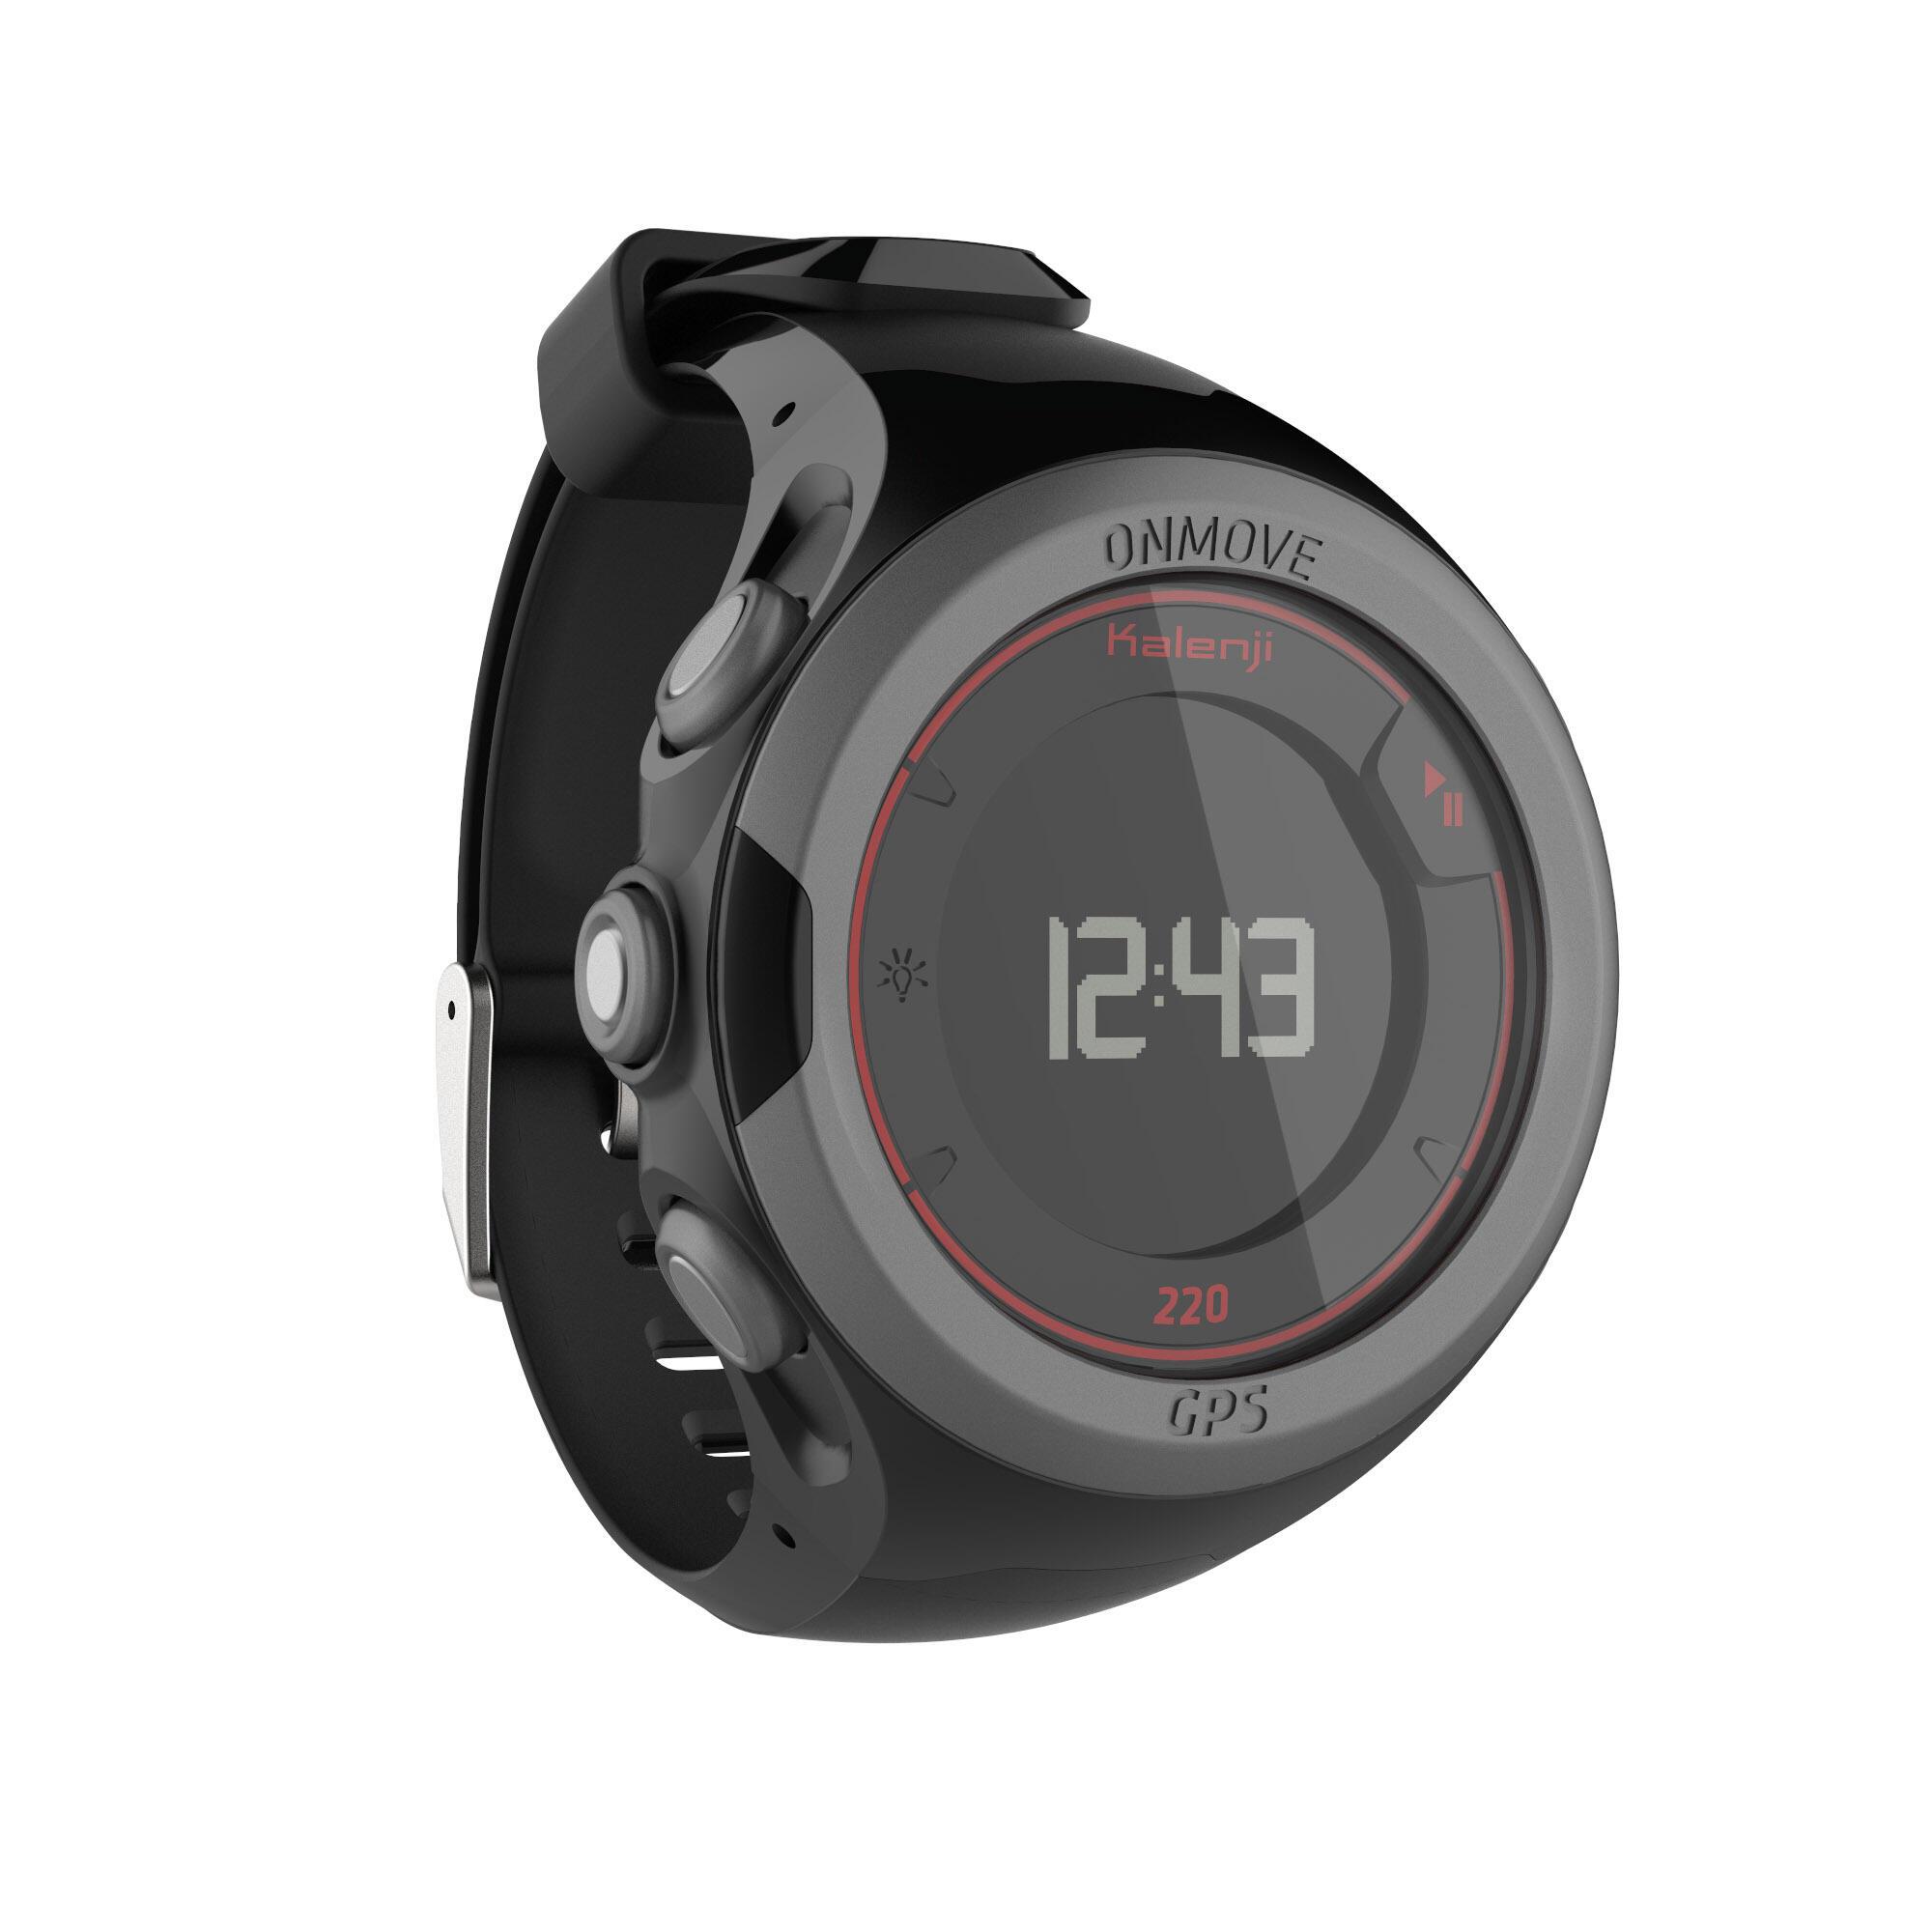 6a915dc7d587 Comprar Relojes Gps Deportivos online